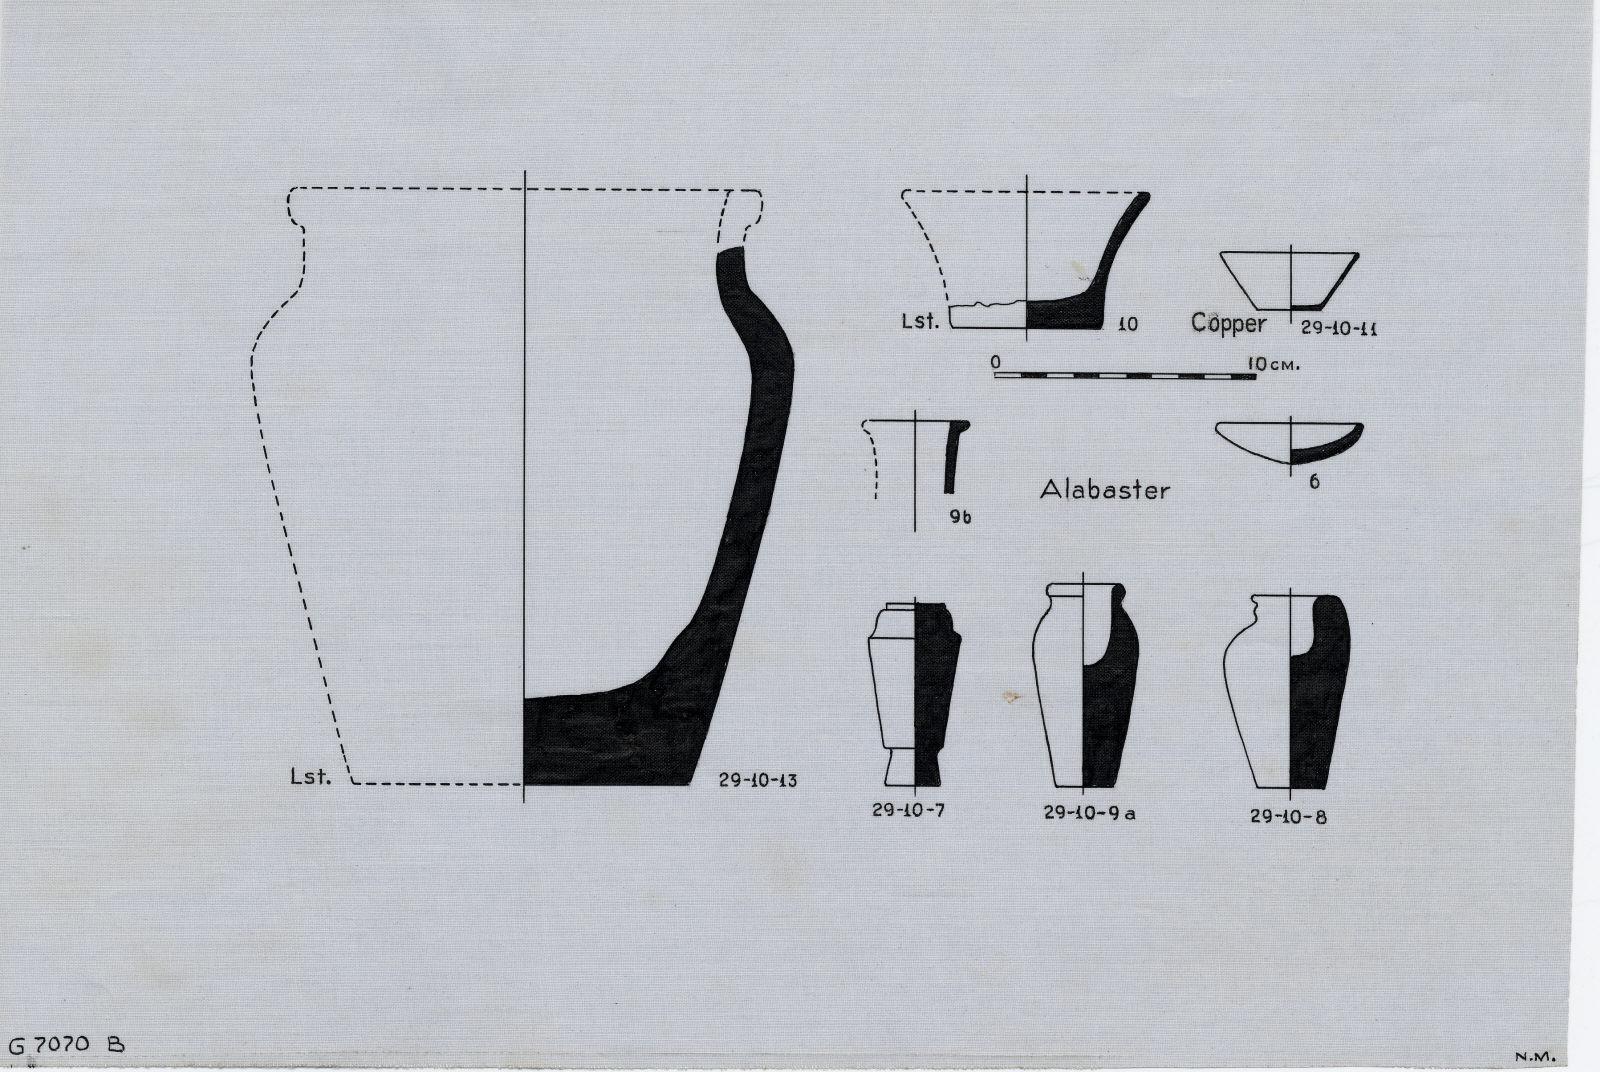 Drawings: G 7070, Shaft B: fragments of vessels